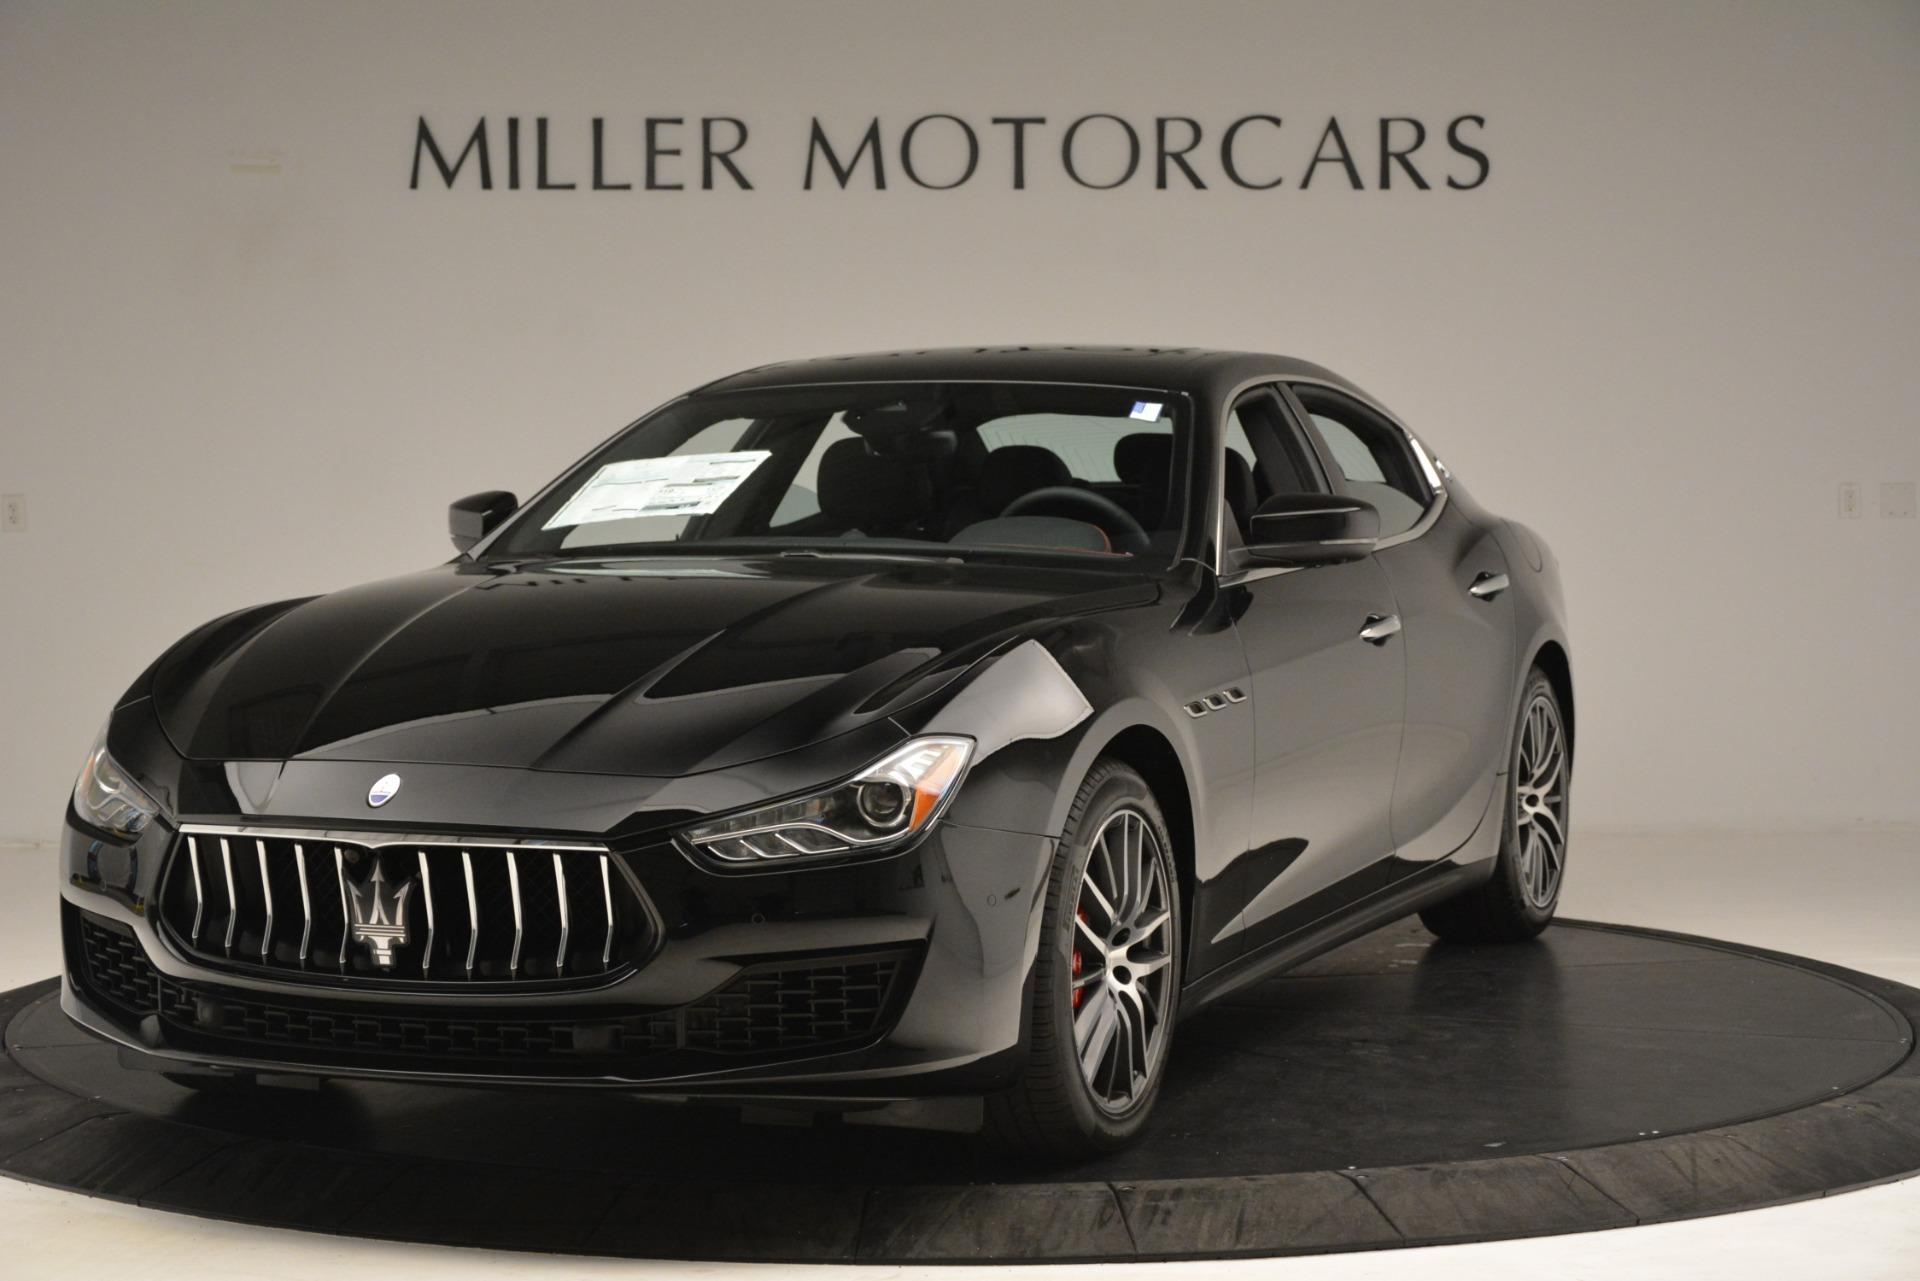 New 2019 Maserati Ghibli S Q4 for sale Sold at McLaren Greenwich in Greenwich CT 06830 1